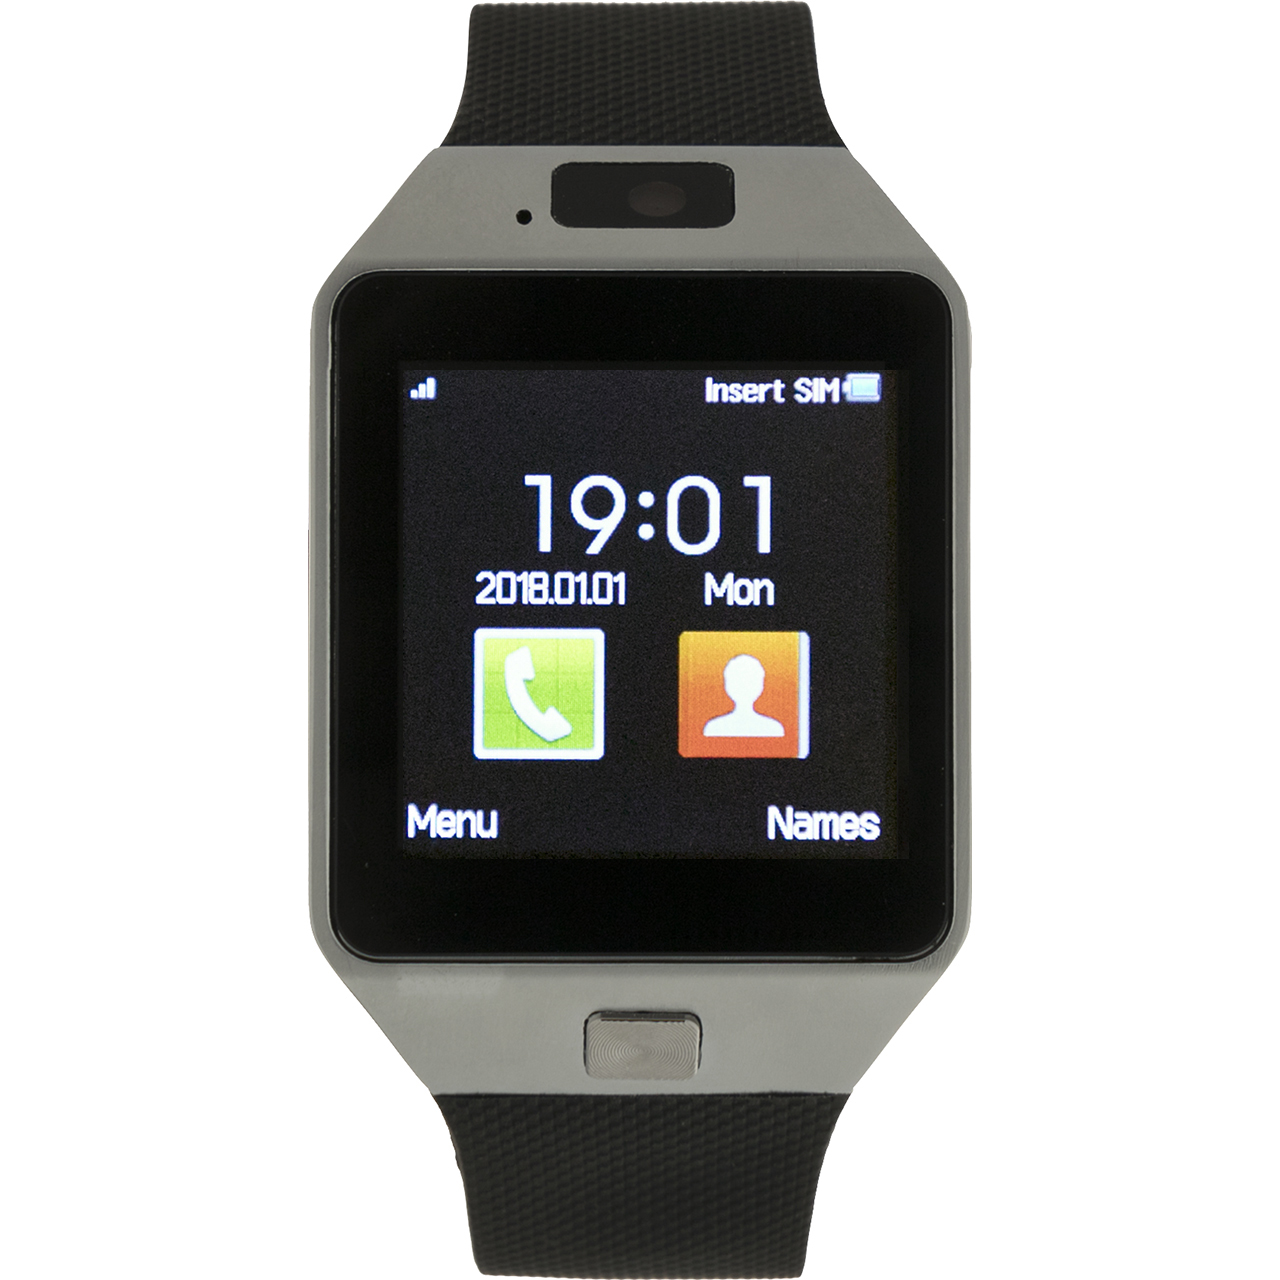 ساعت هوشمند تی سریز مدل DZ09 الف 001